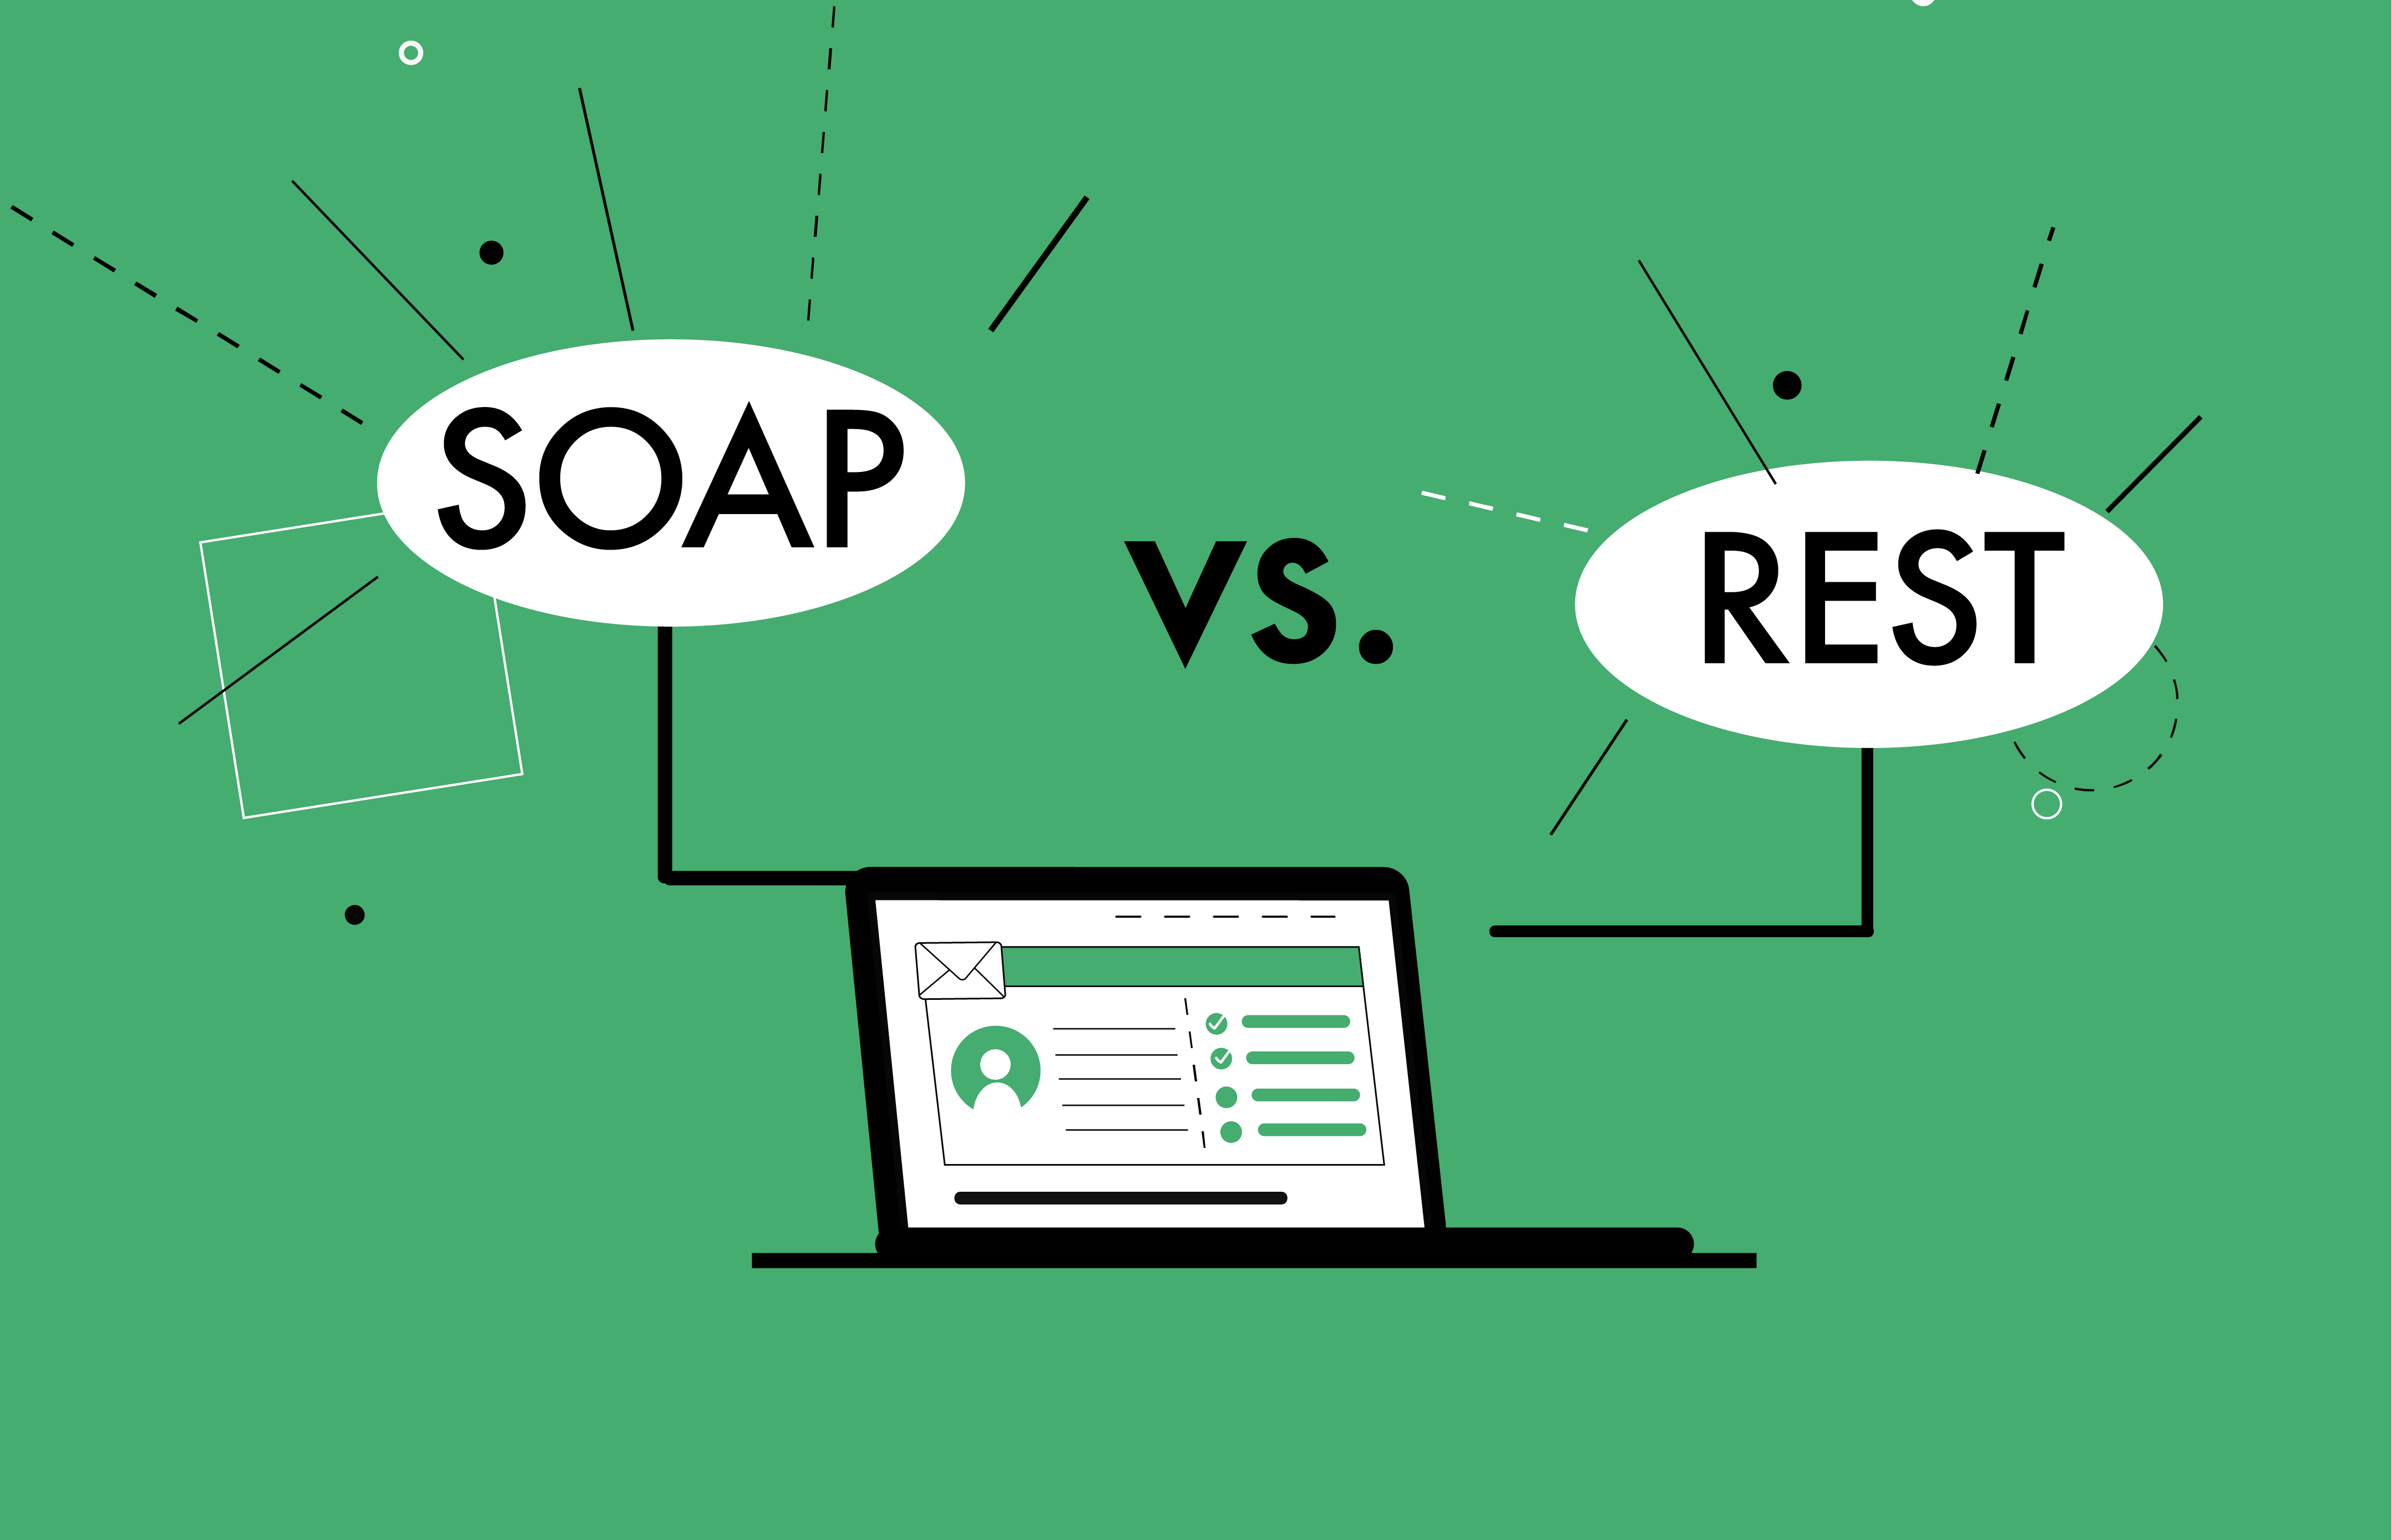 soap vs rest